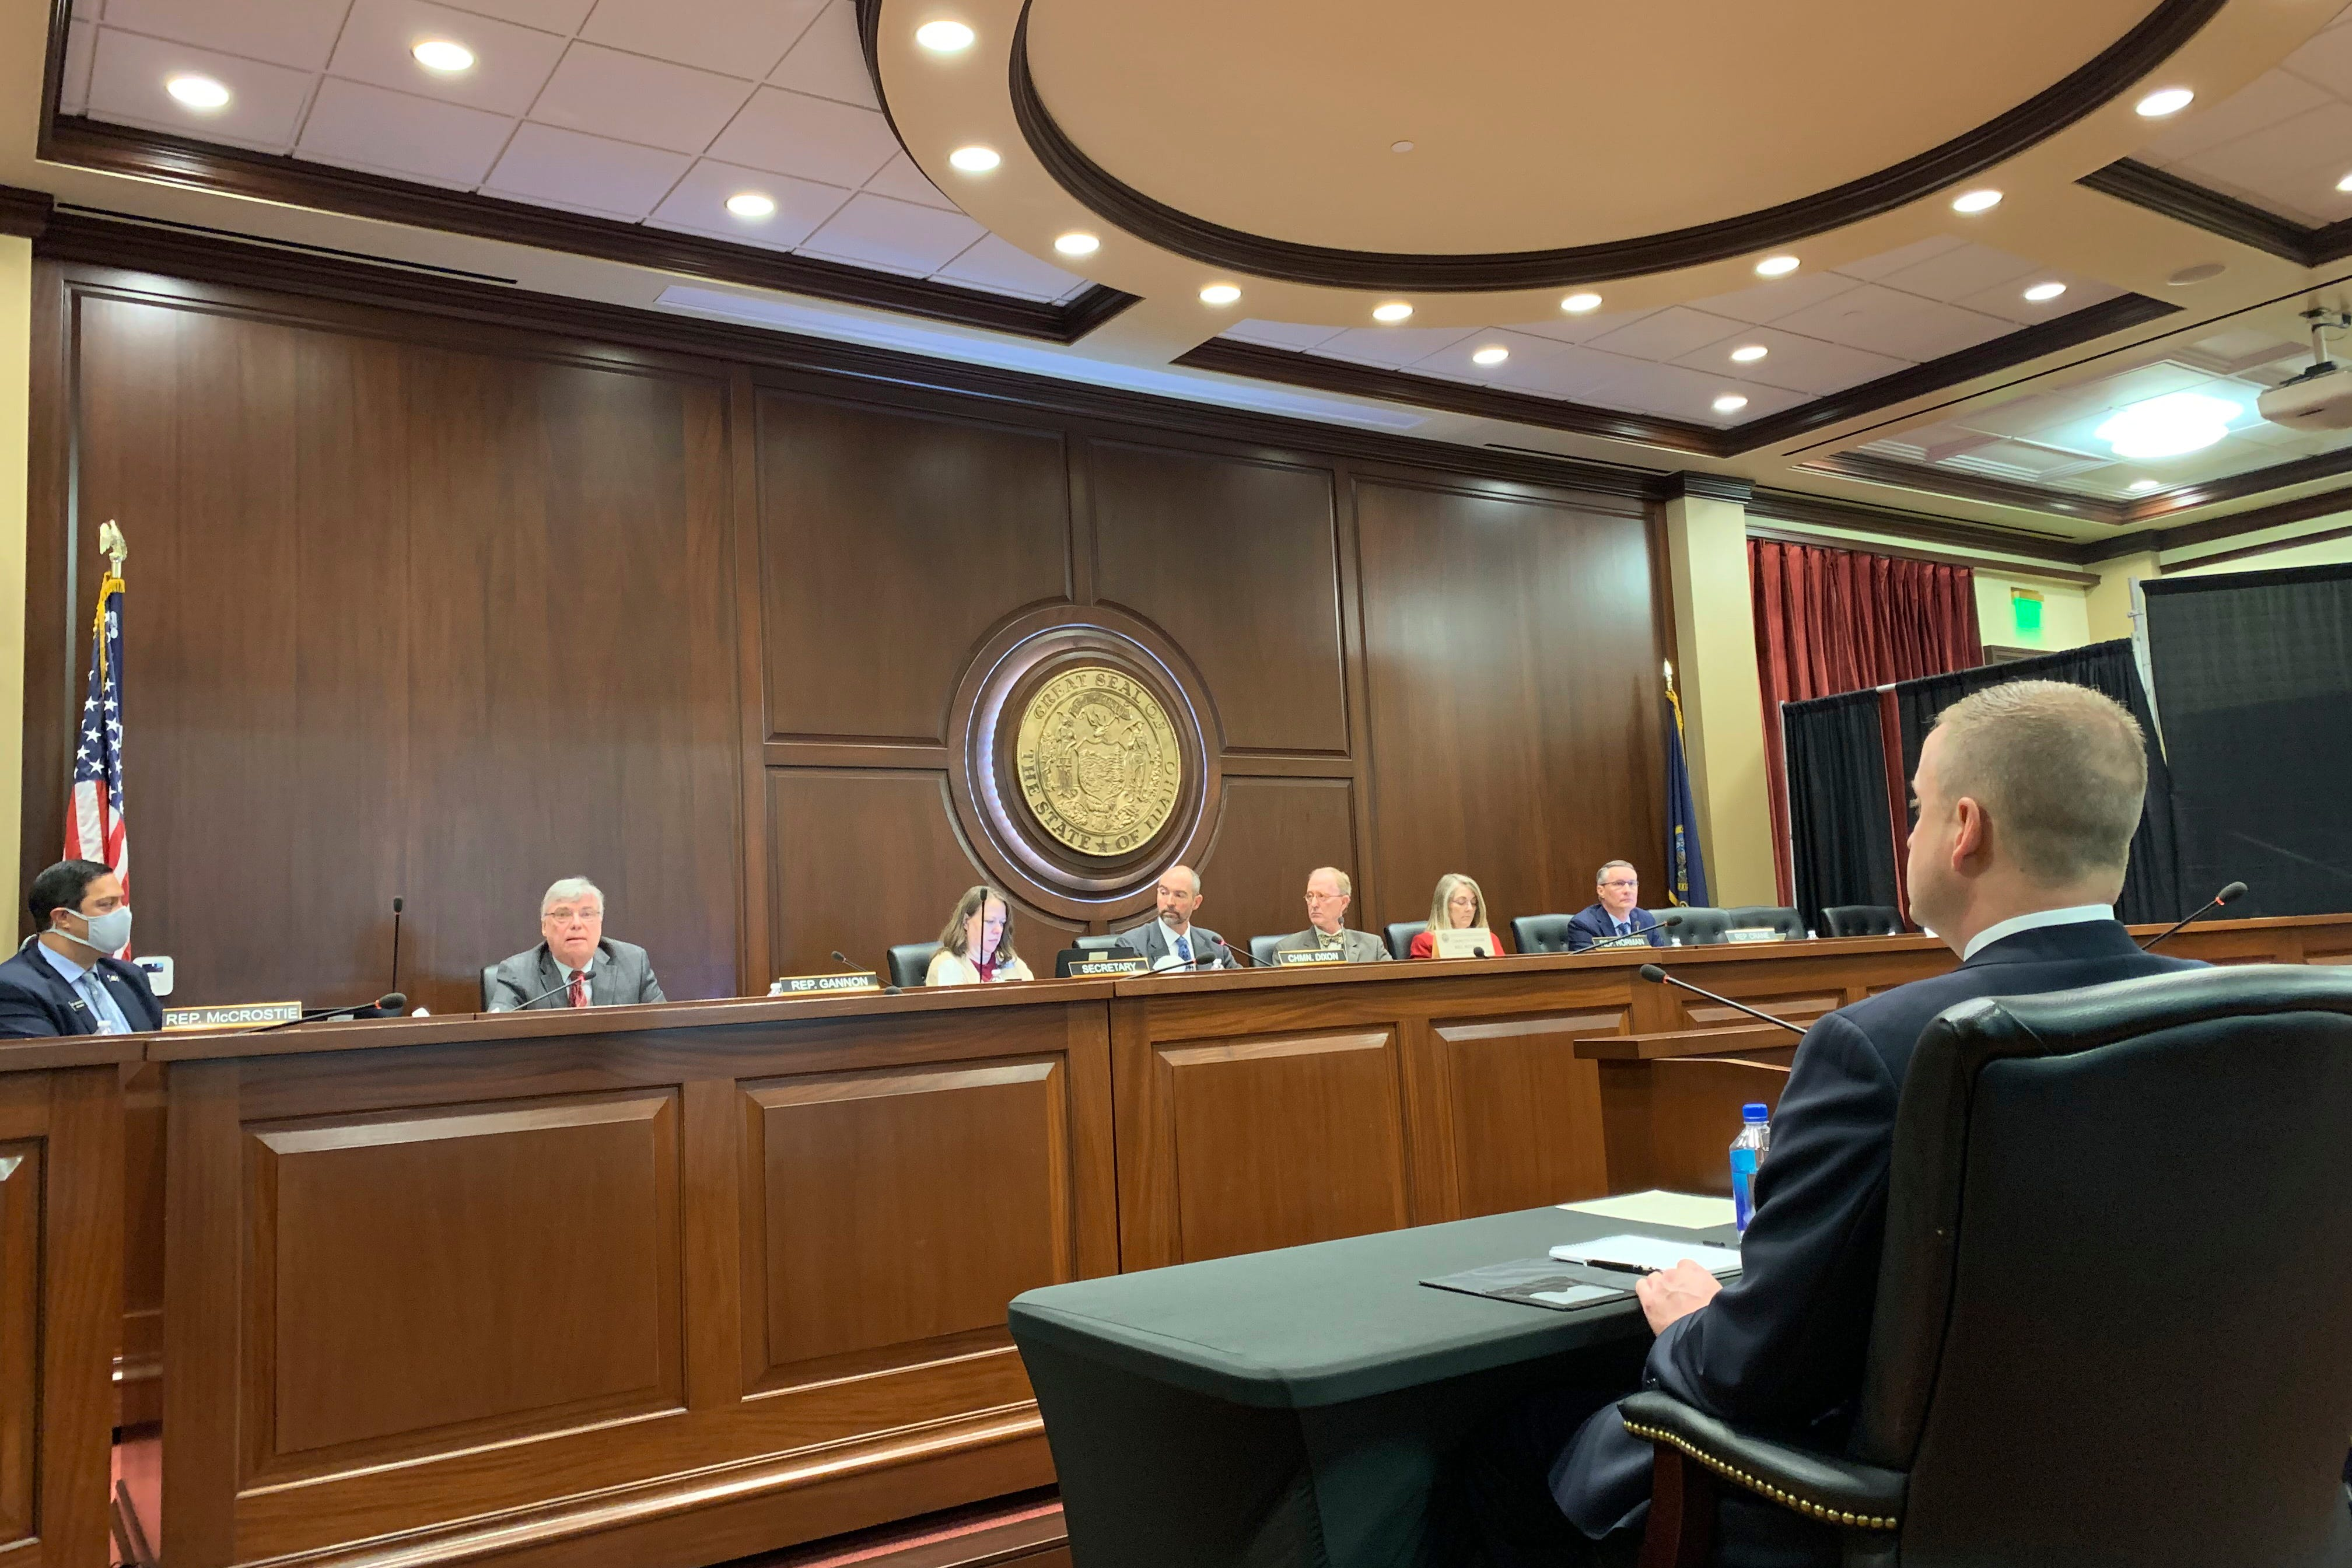 Idaho legislative intern faced 'overwhelming' hassle after rape report 2